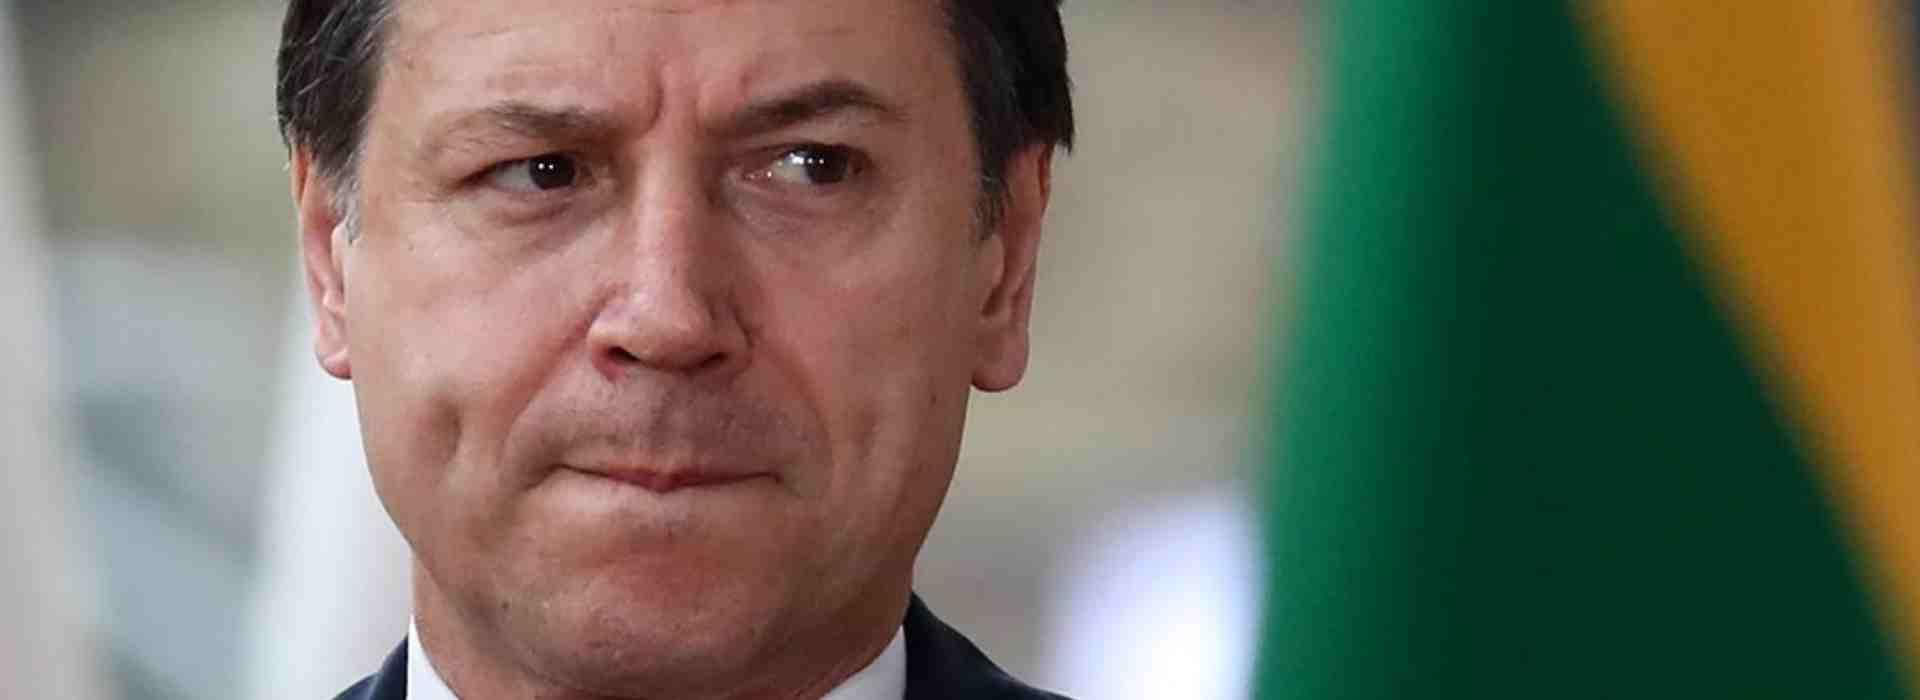 Causa civile per Conte, Fontana e Speranza: citazione di 100 milioni di euro